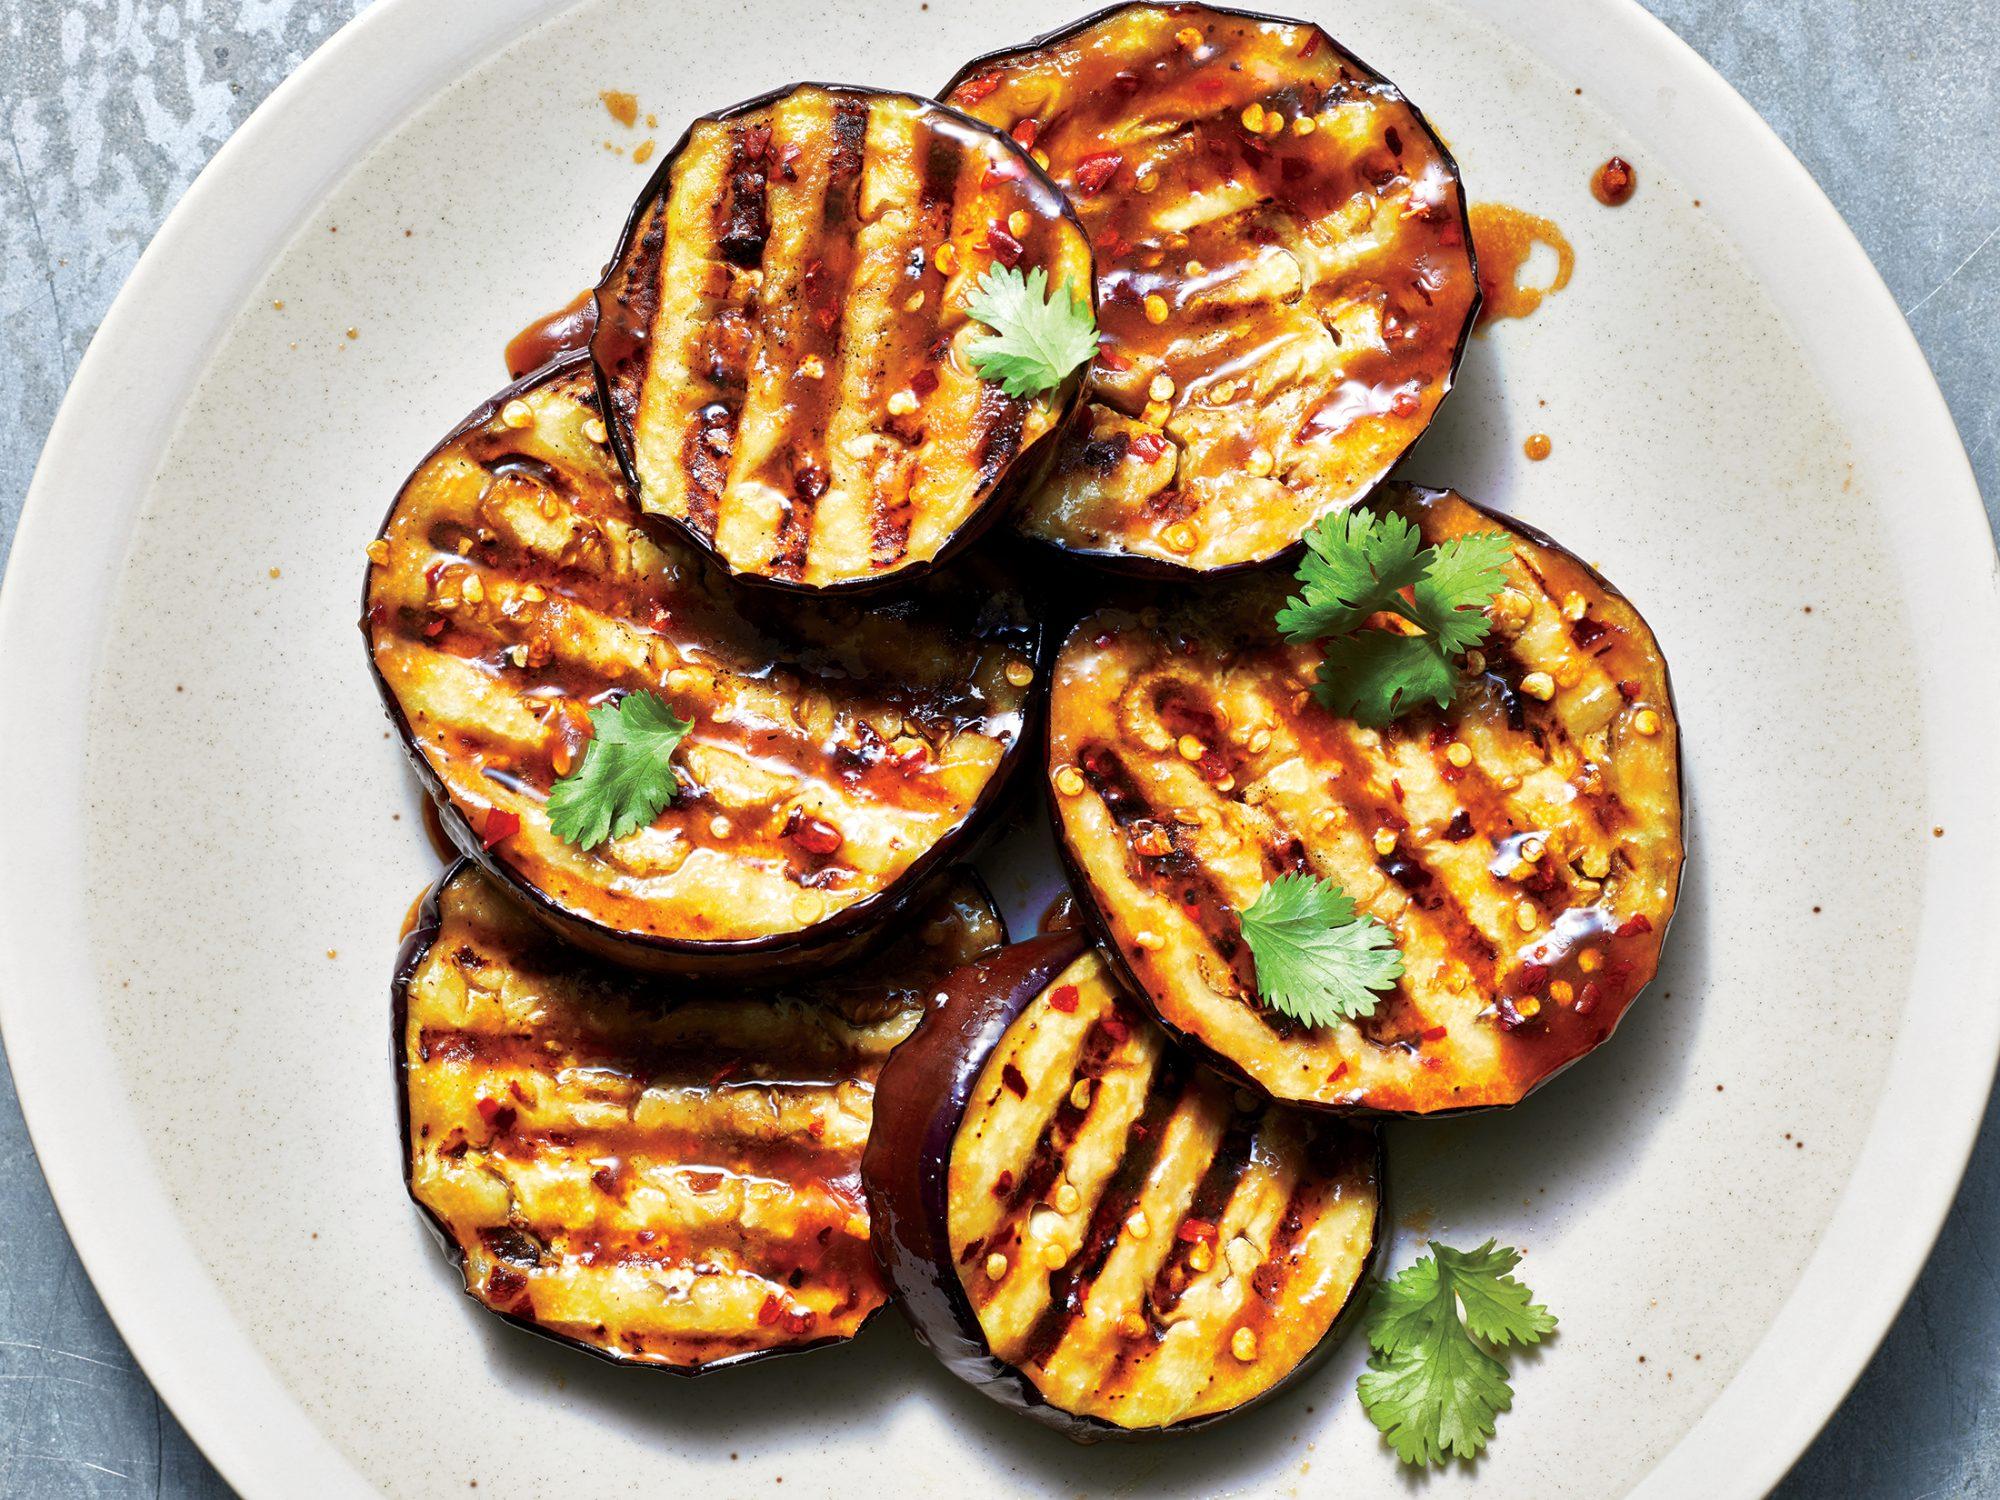 Miso-Glazed Eggplant Steaks